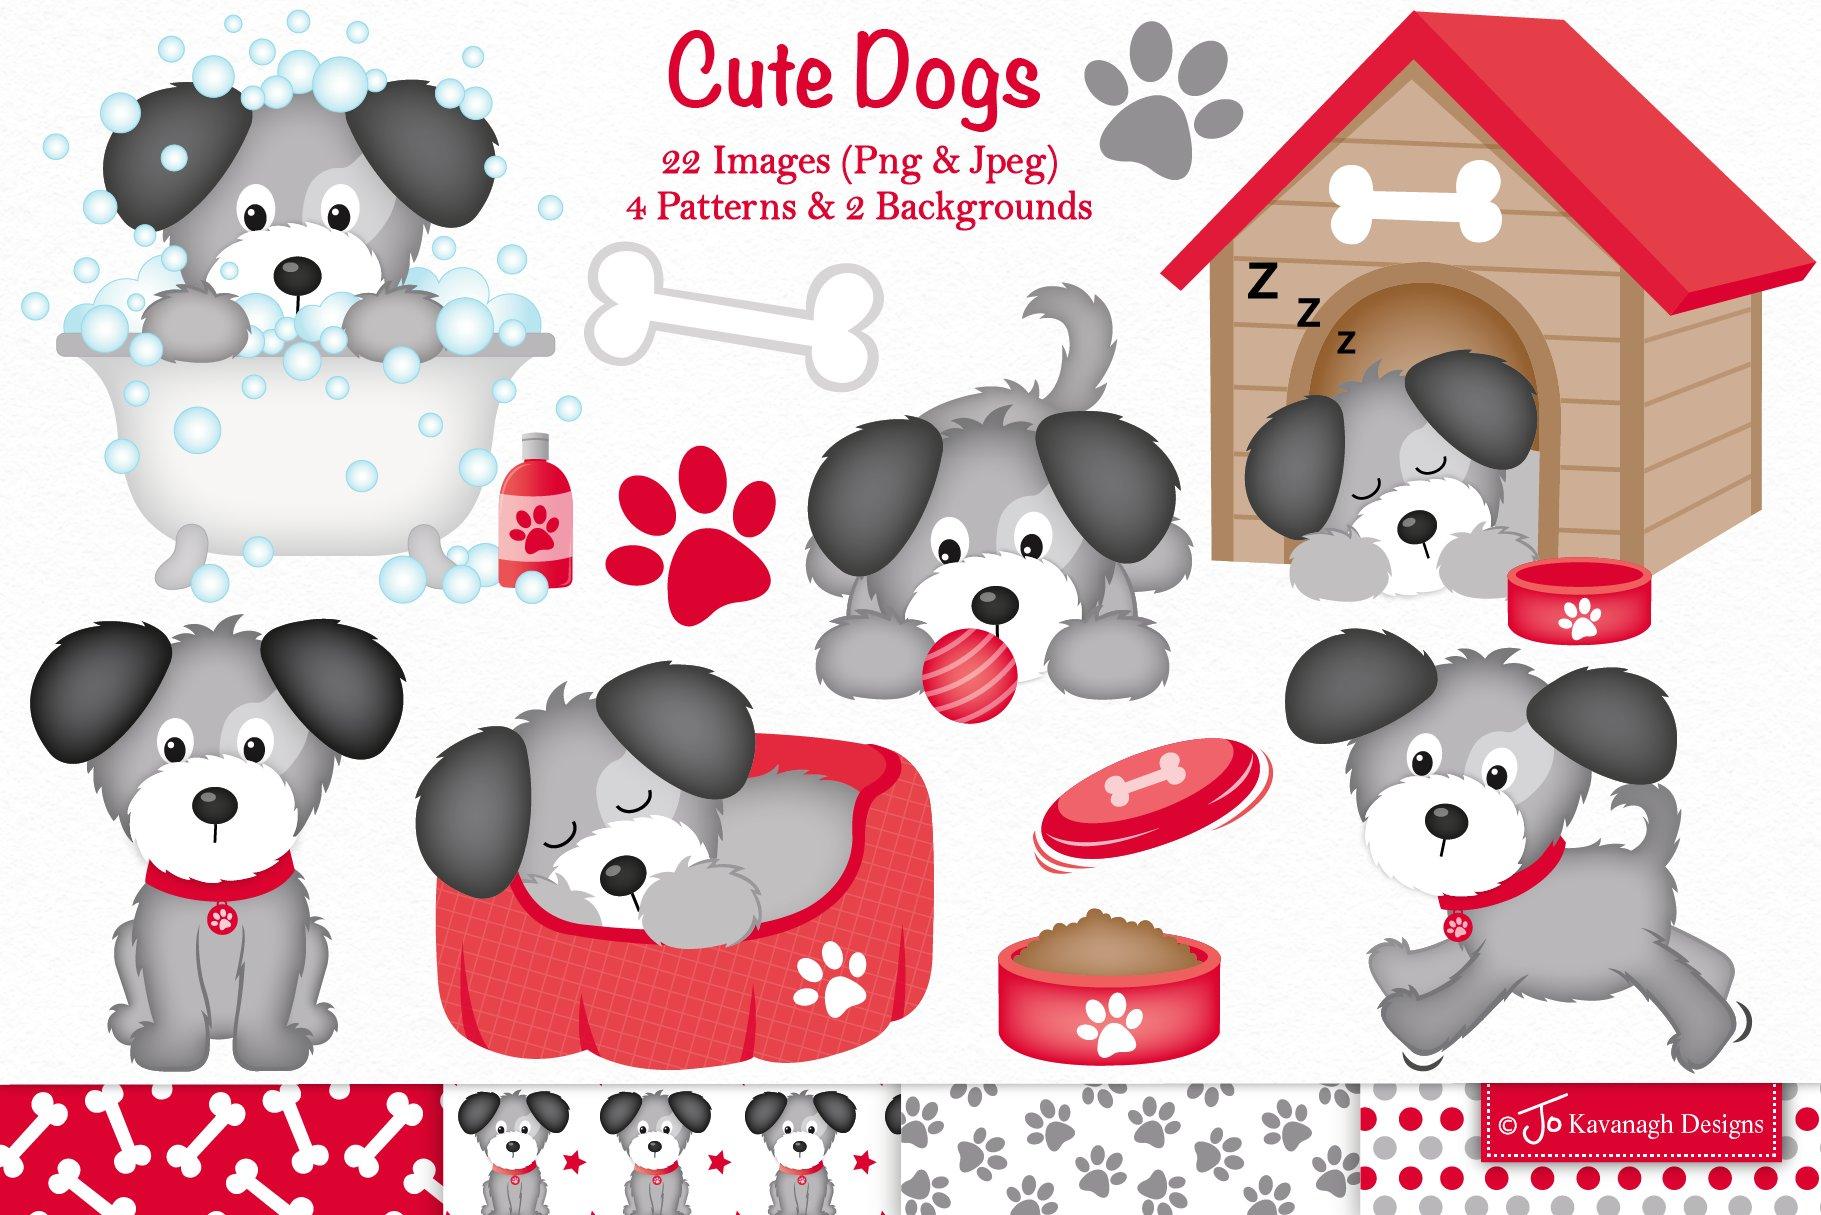 Puppy Dog Clipart C37 Pre Designed Photoshop Graphics Creative Market